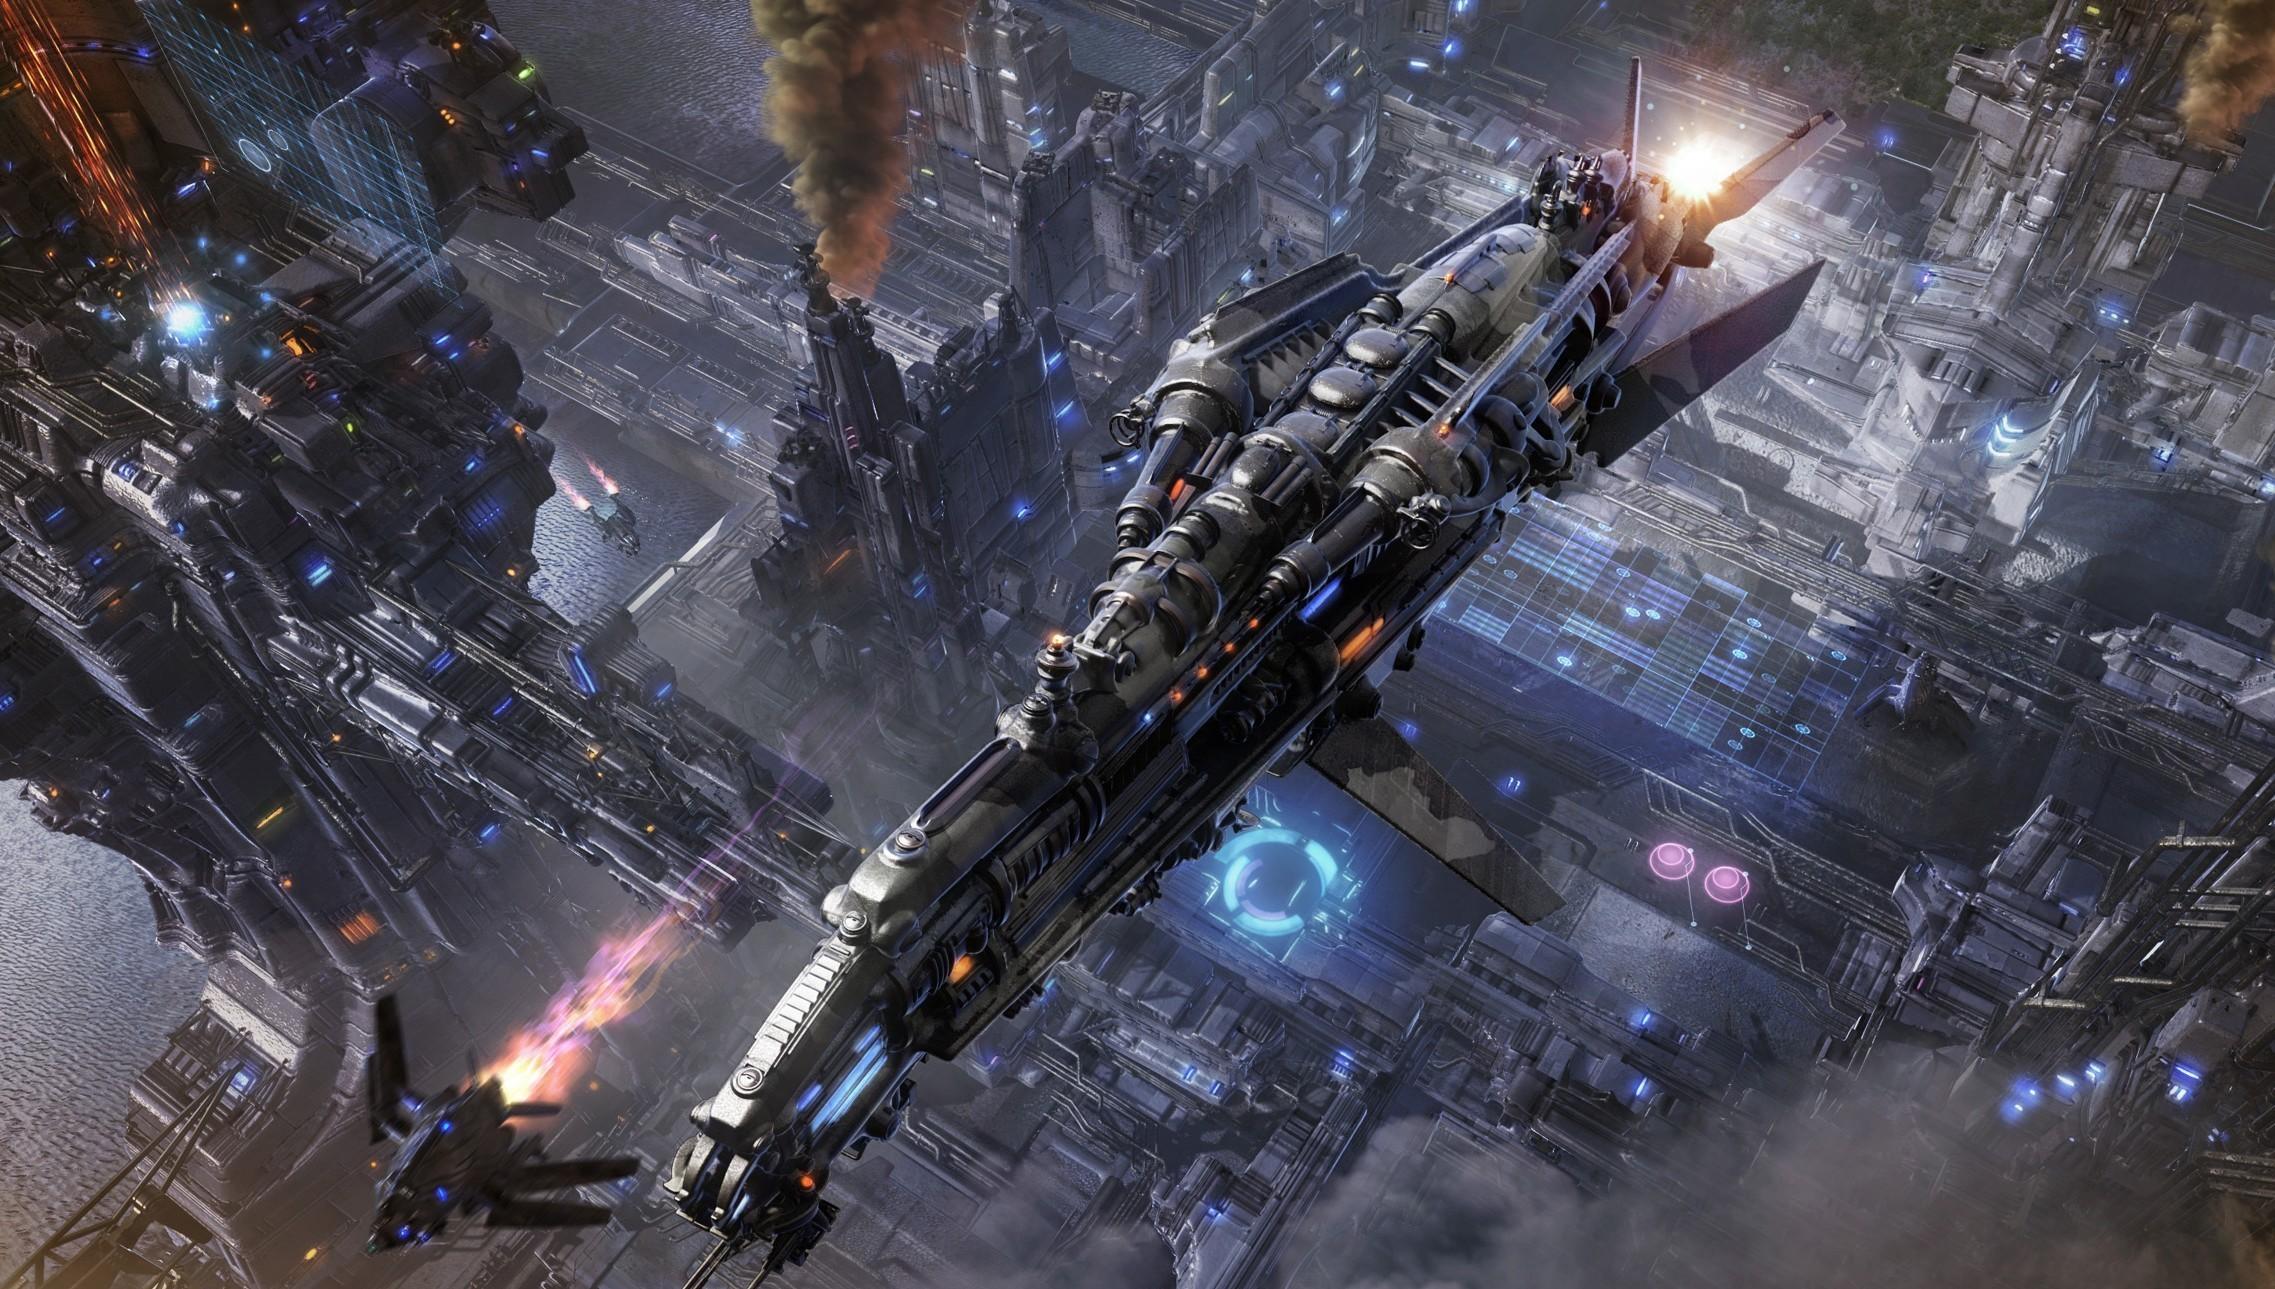 Sci Fi   Spaceship Wallpaper 2275x1289